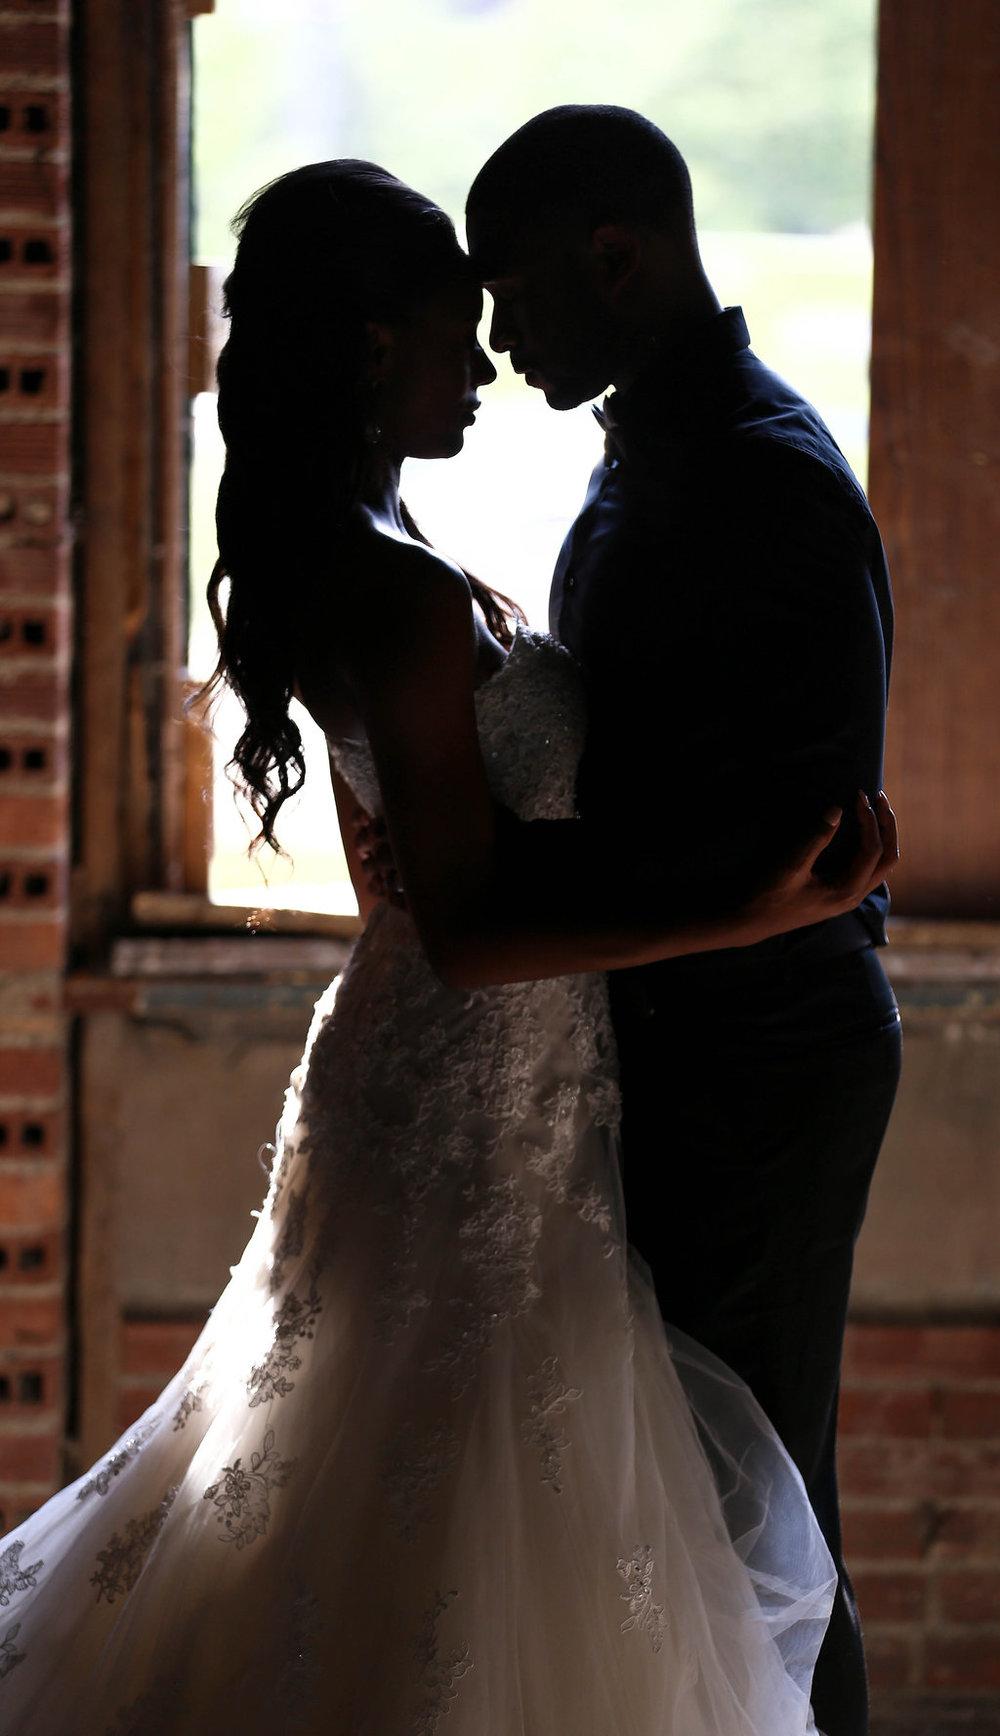 Josh&CourtneyJames_JazzyMaePhotography_ClevelandWeddingPhotography(274).jpg